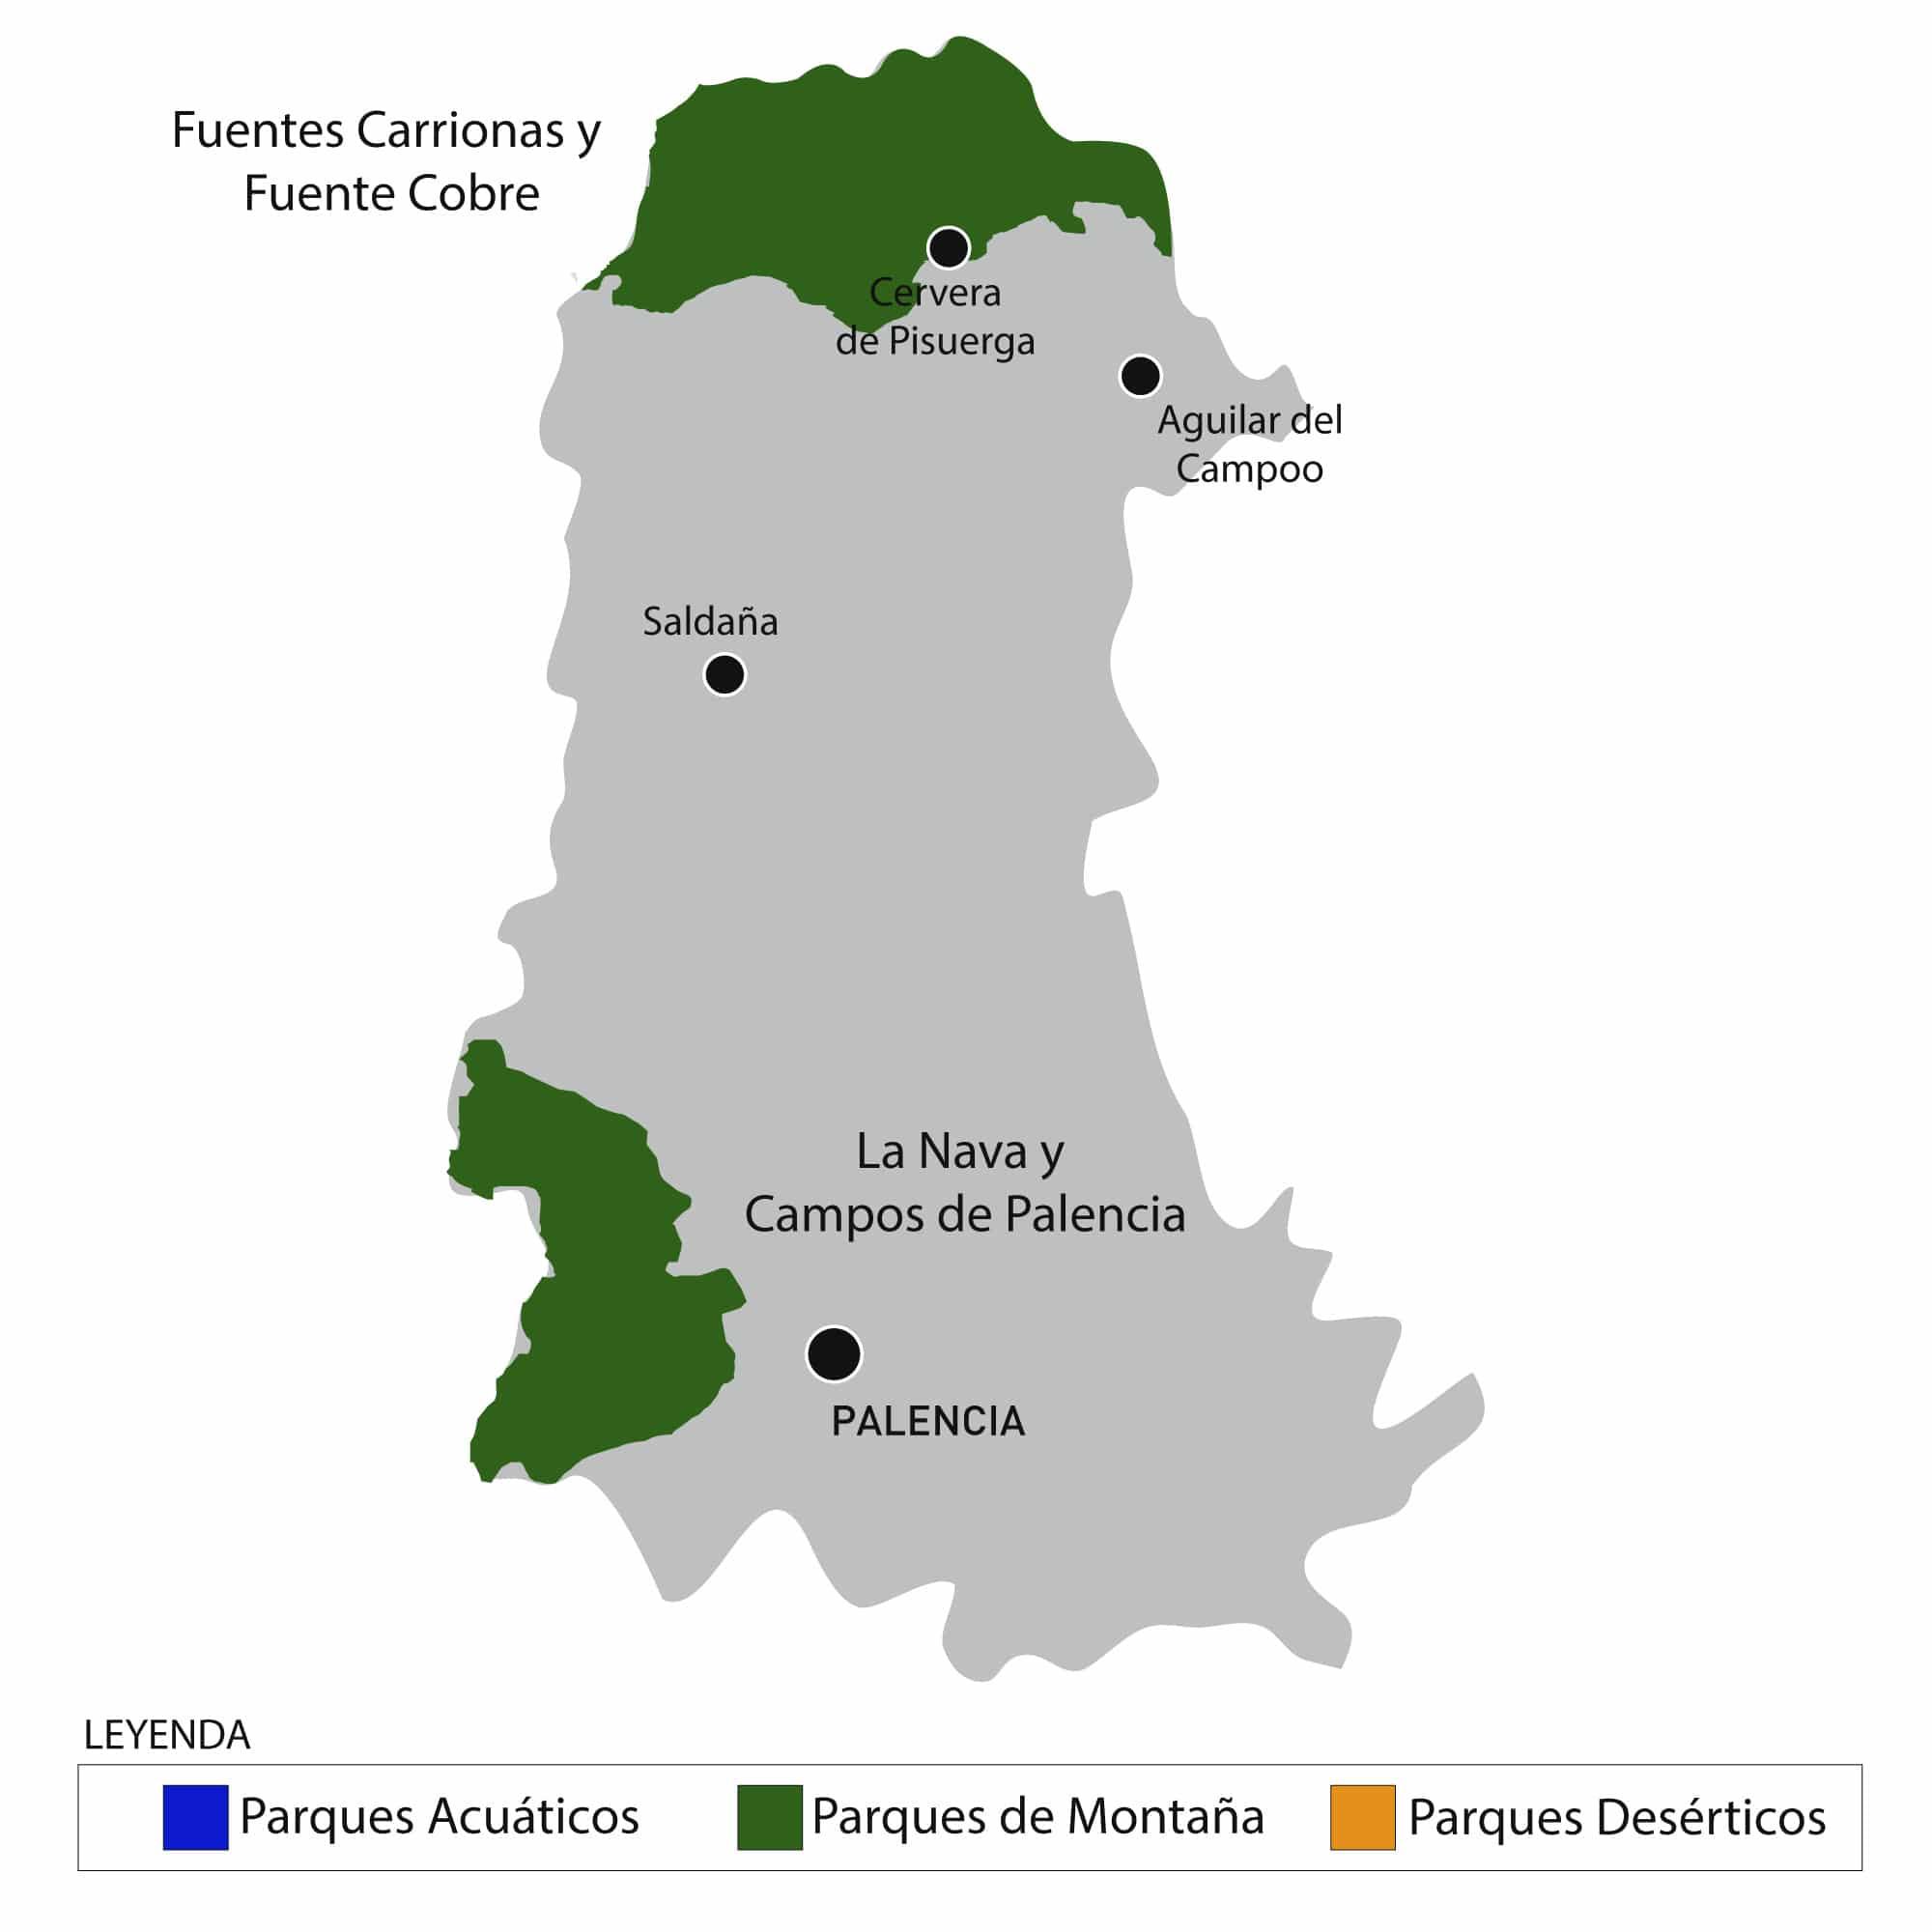 Parques_naturales-de-palencia-turismo-activo-en-palencia-españa-fascinante